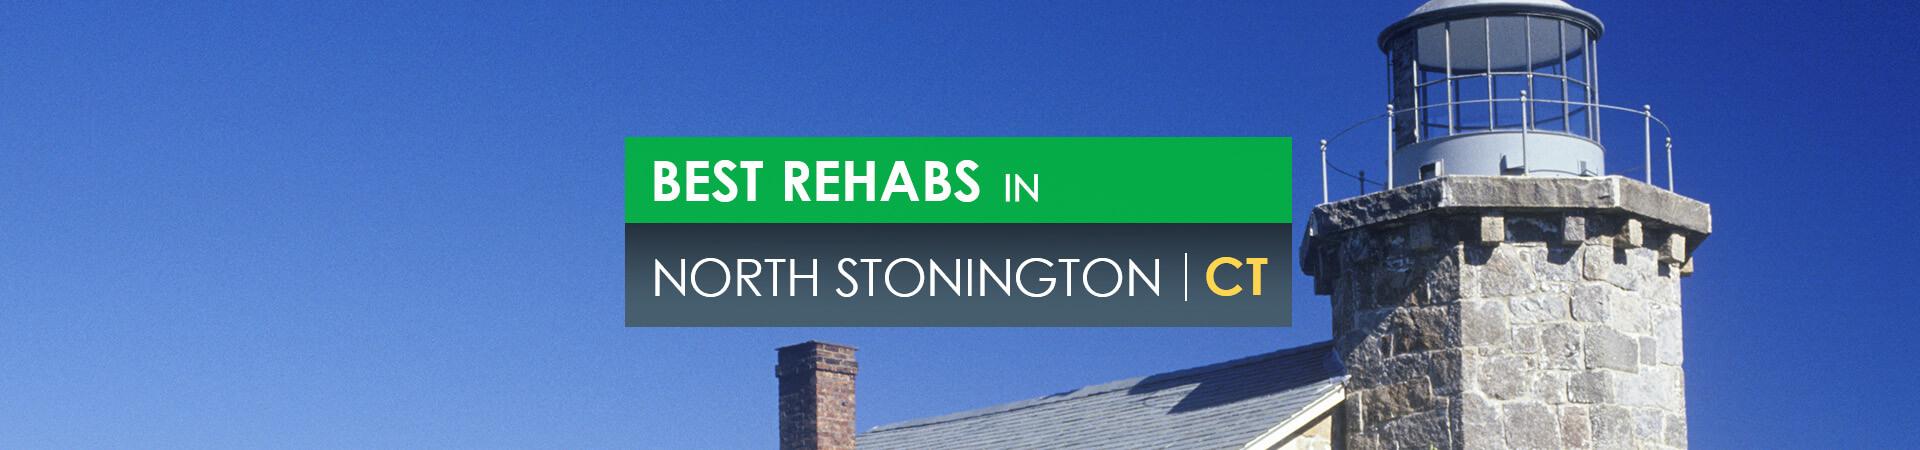 Best rehabs in North Stonington, CT